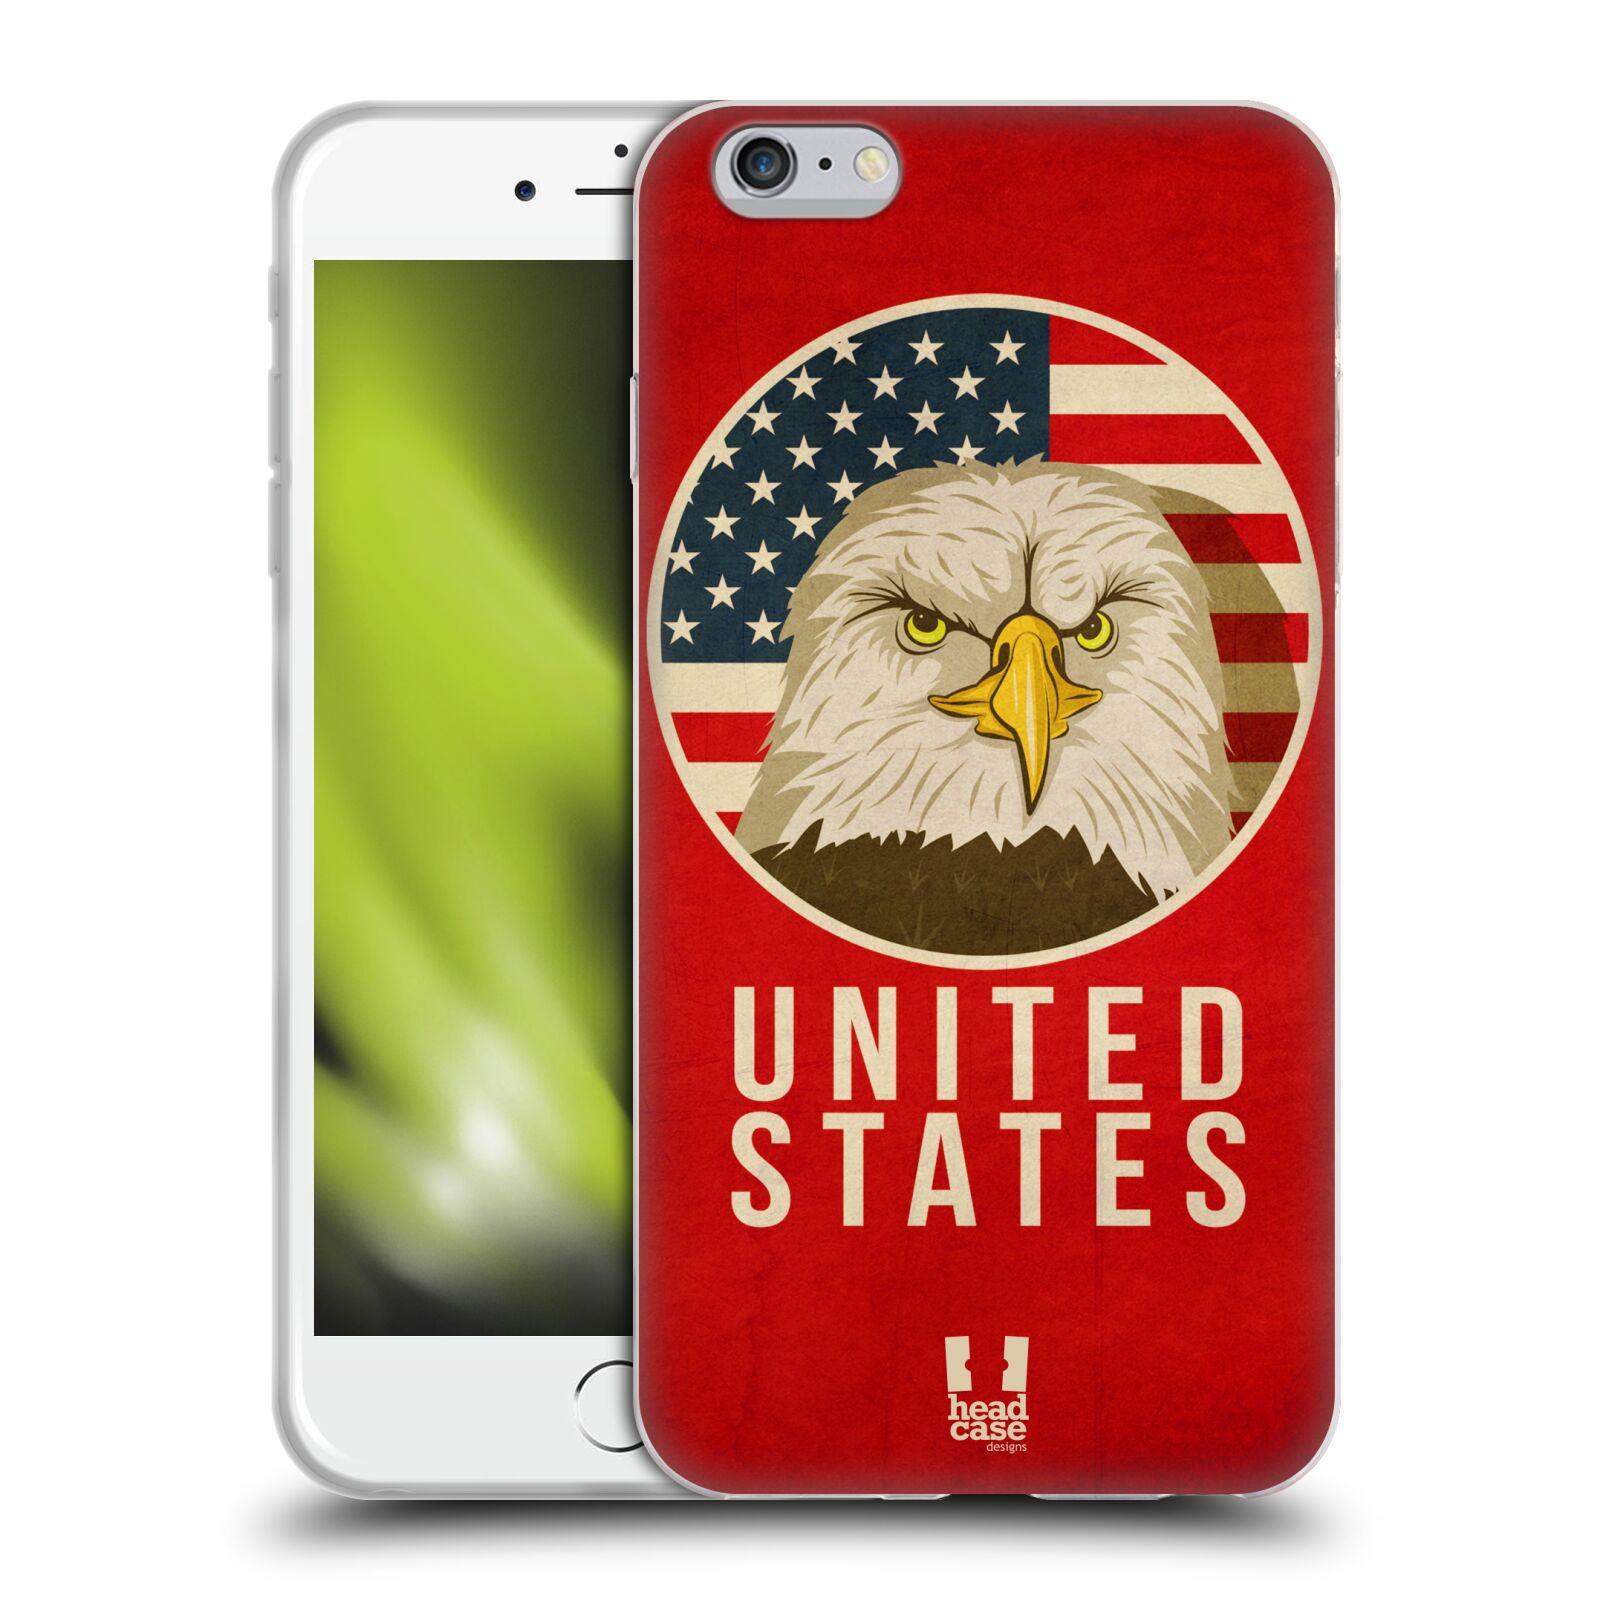 HEAD CASE silikonový obal na mobil Apple Iphone 6 PLUS/ 6S PLUS vzor Patriotismus zvíře symbol USA OREL